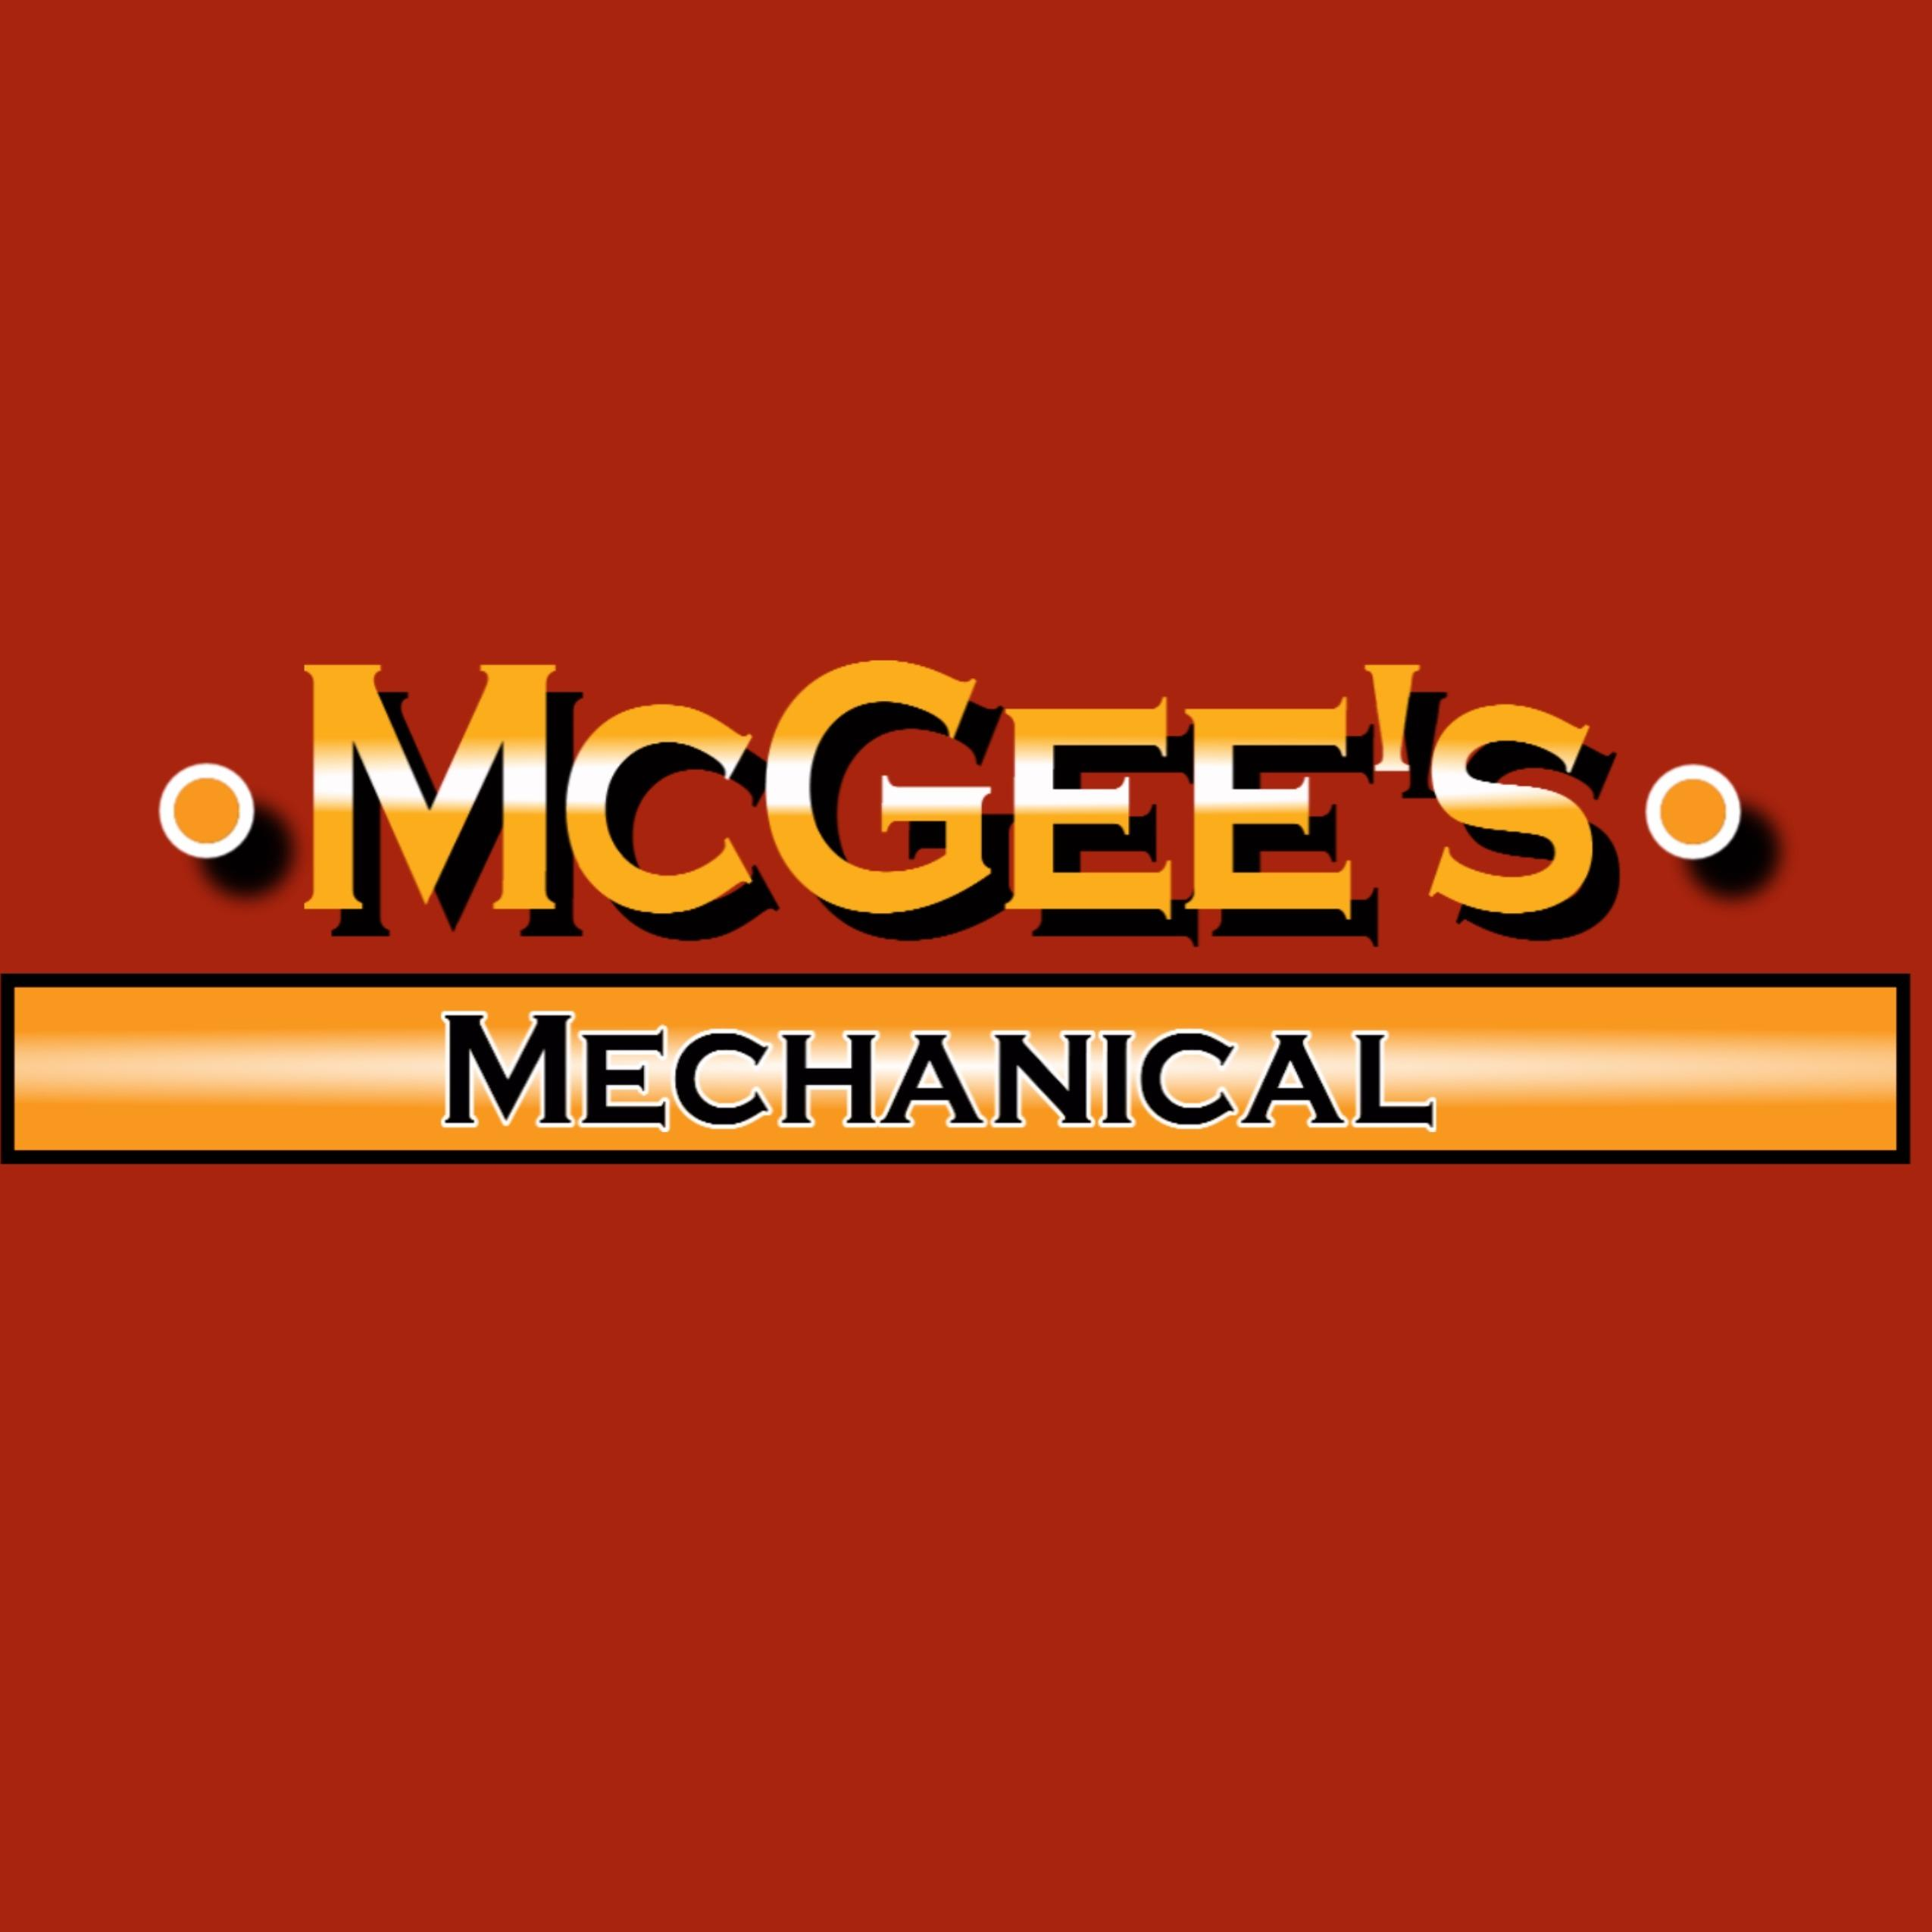 McGee's Mechanical image 2